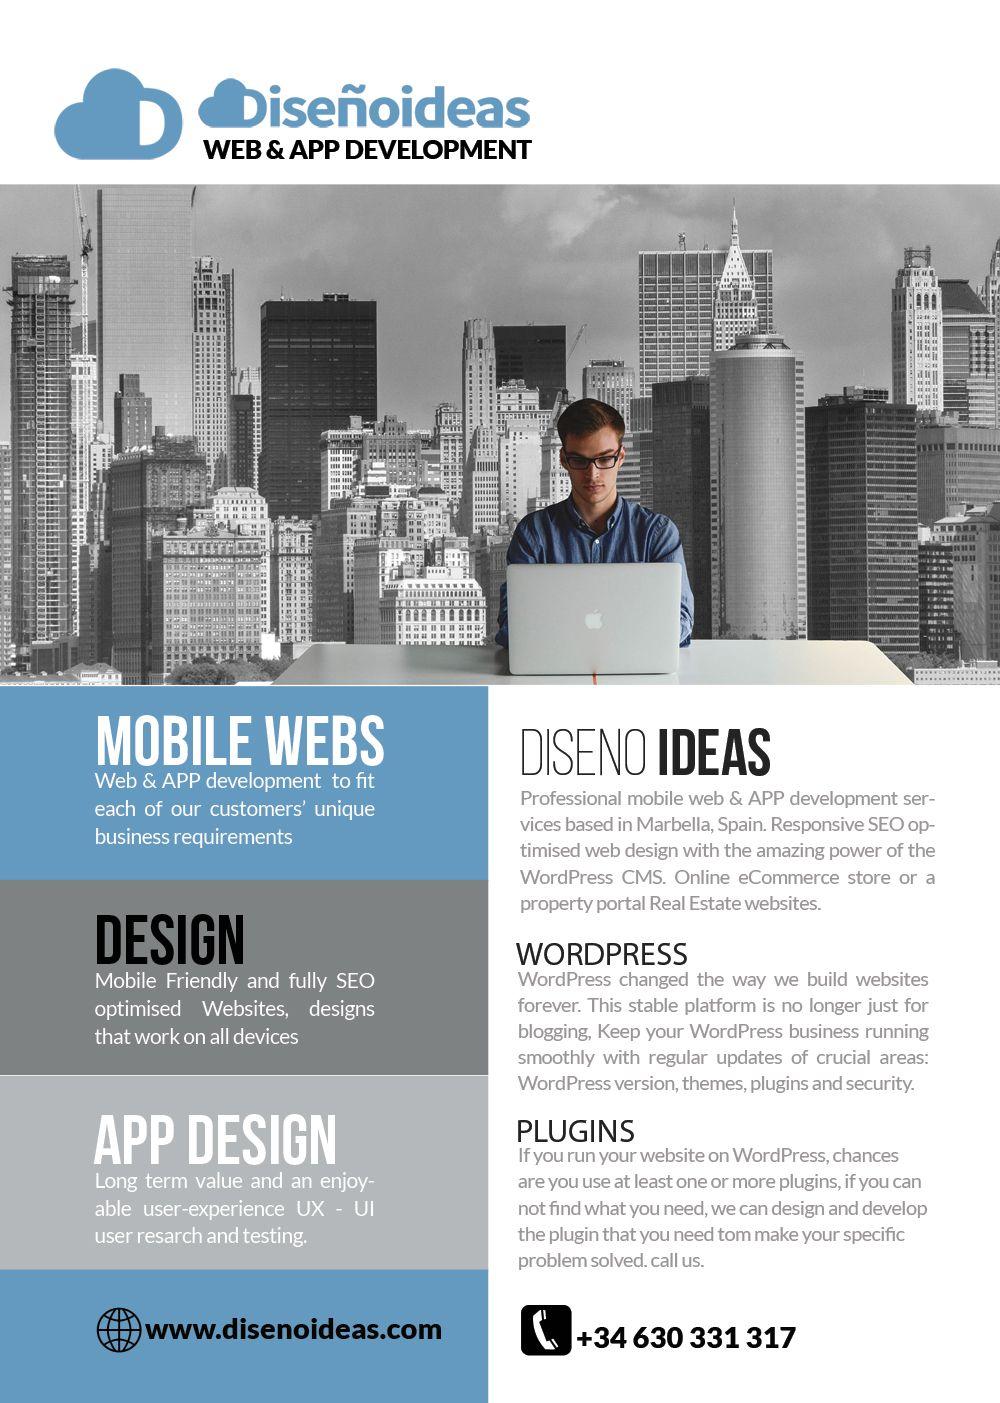 Mobile Web & APP Design, website Development Disenoideas Marbella